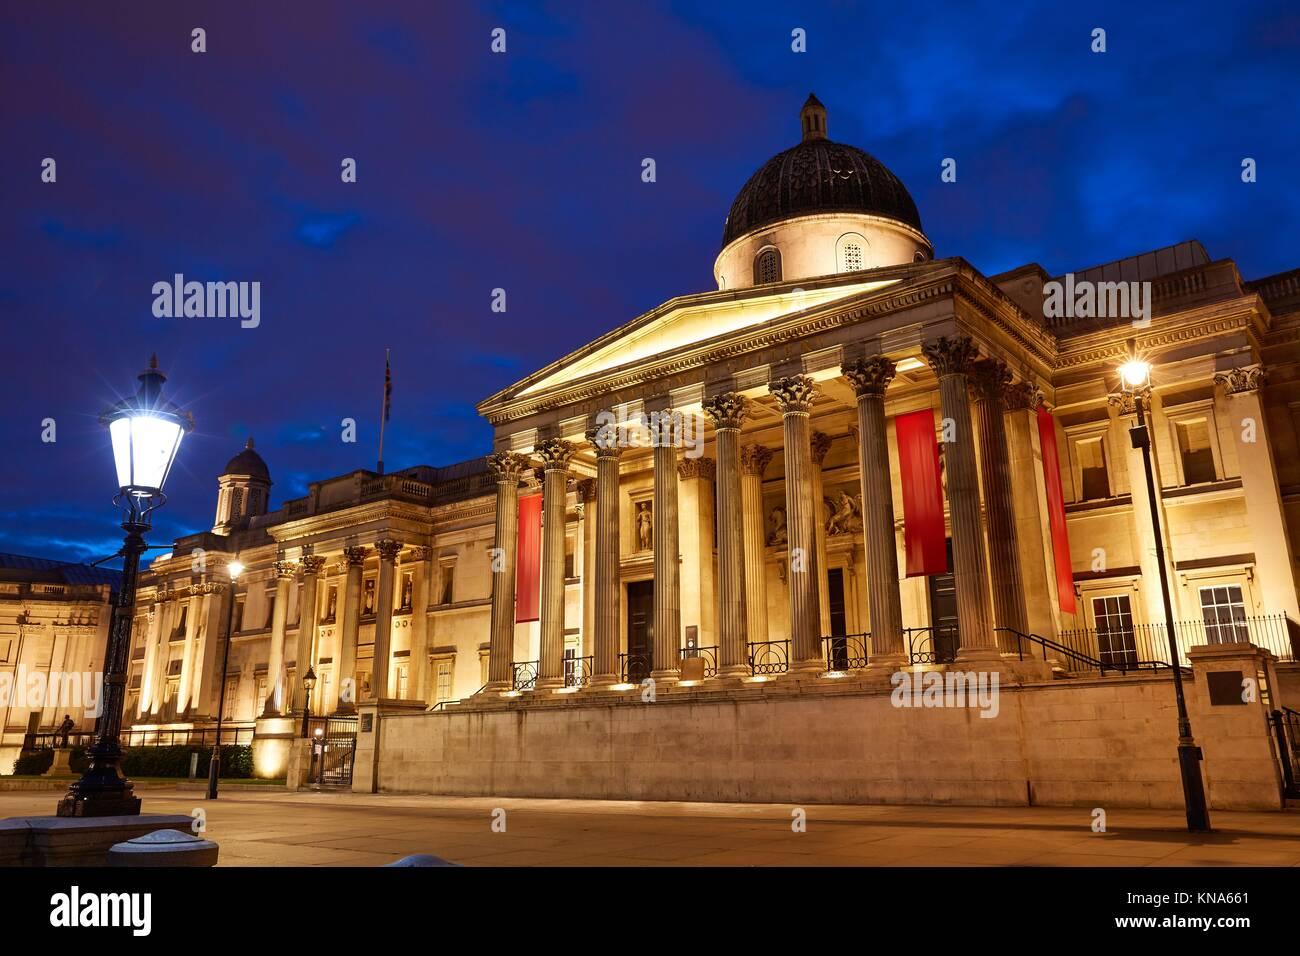 Nacional de Londres Galelery atardecer en Trafalgar Square en Inglaterra. Imagen De Stock